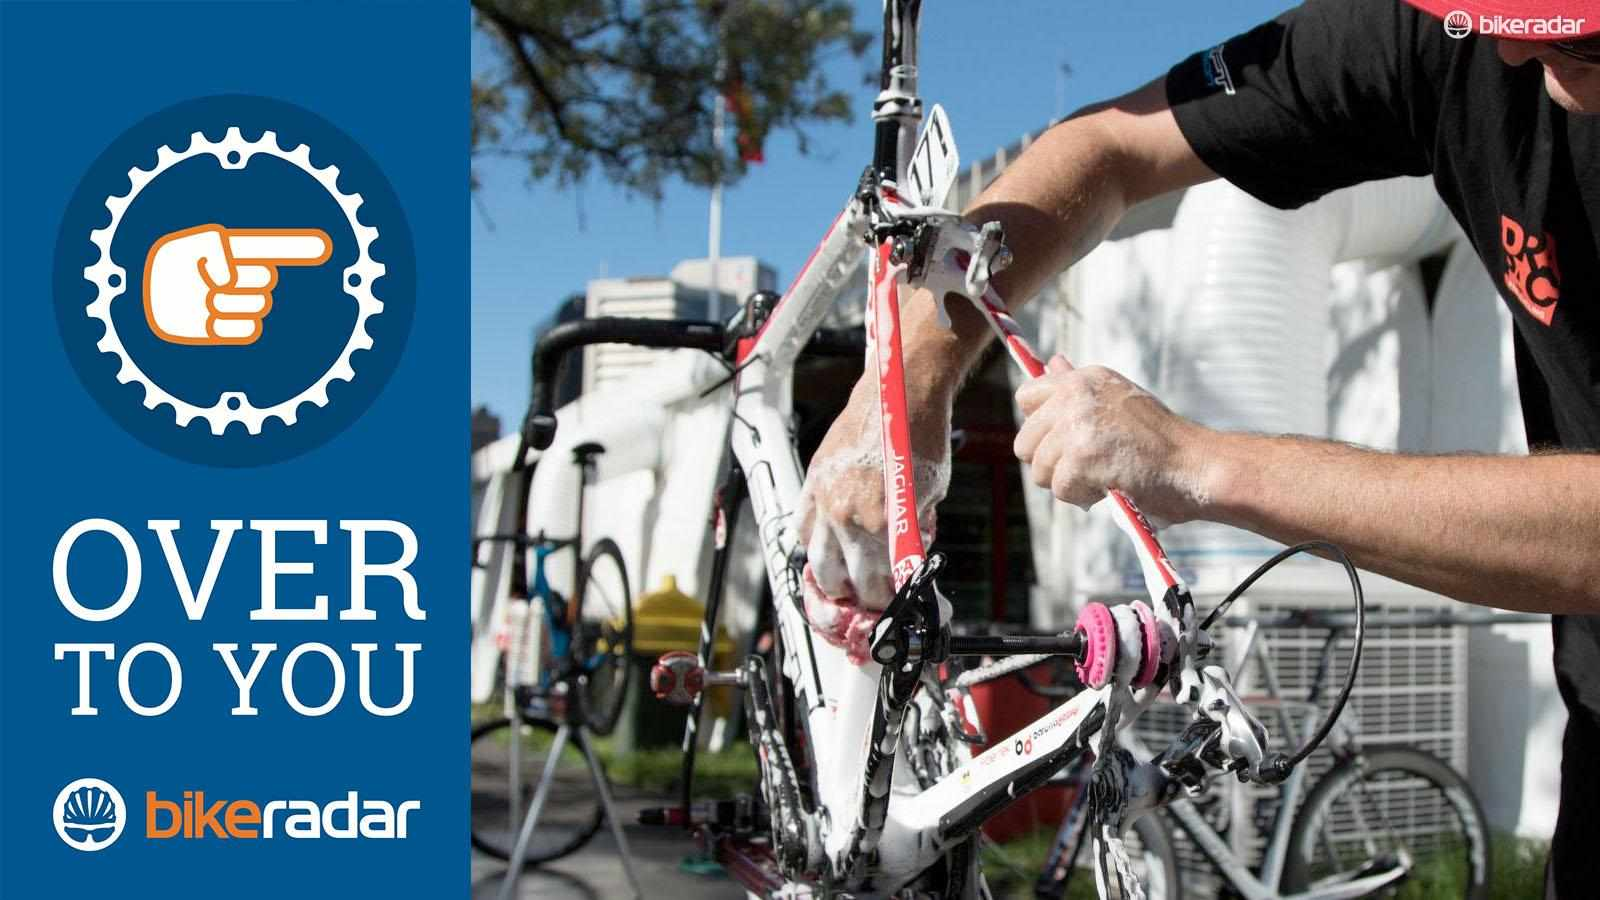 What bike maintenance do you hate to do?